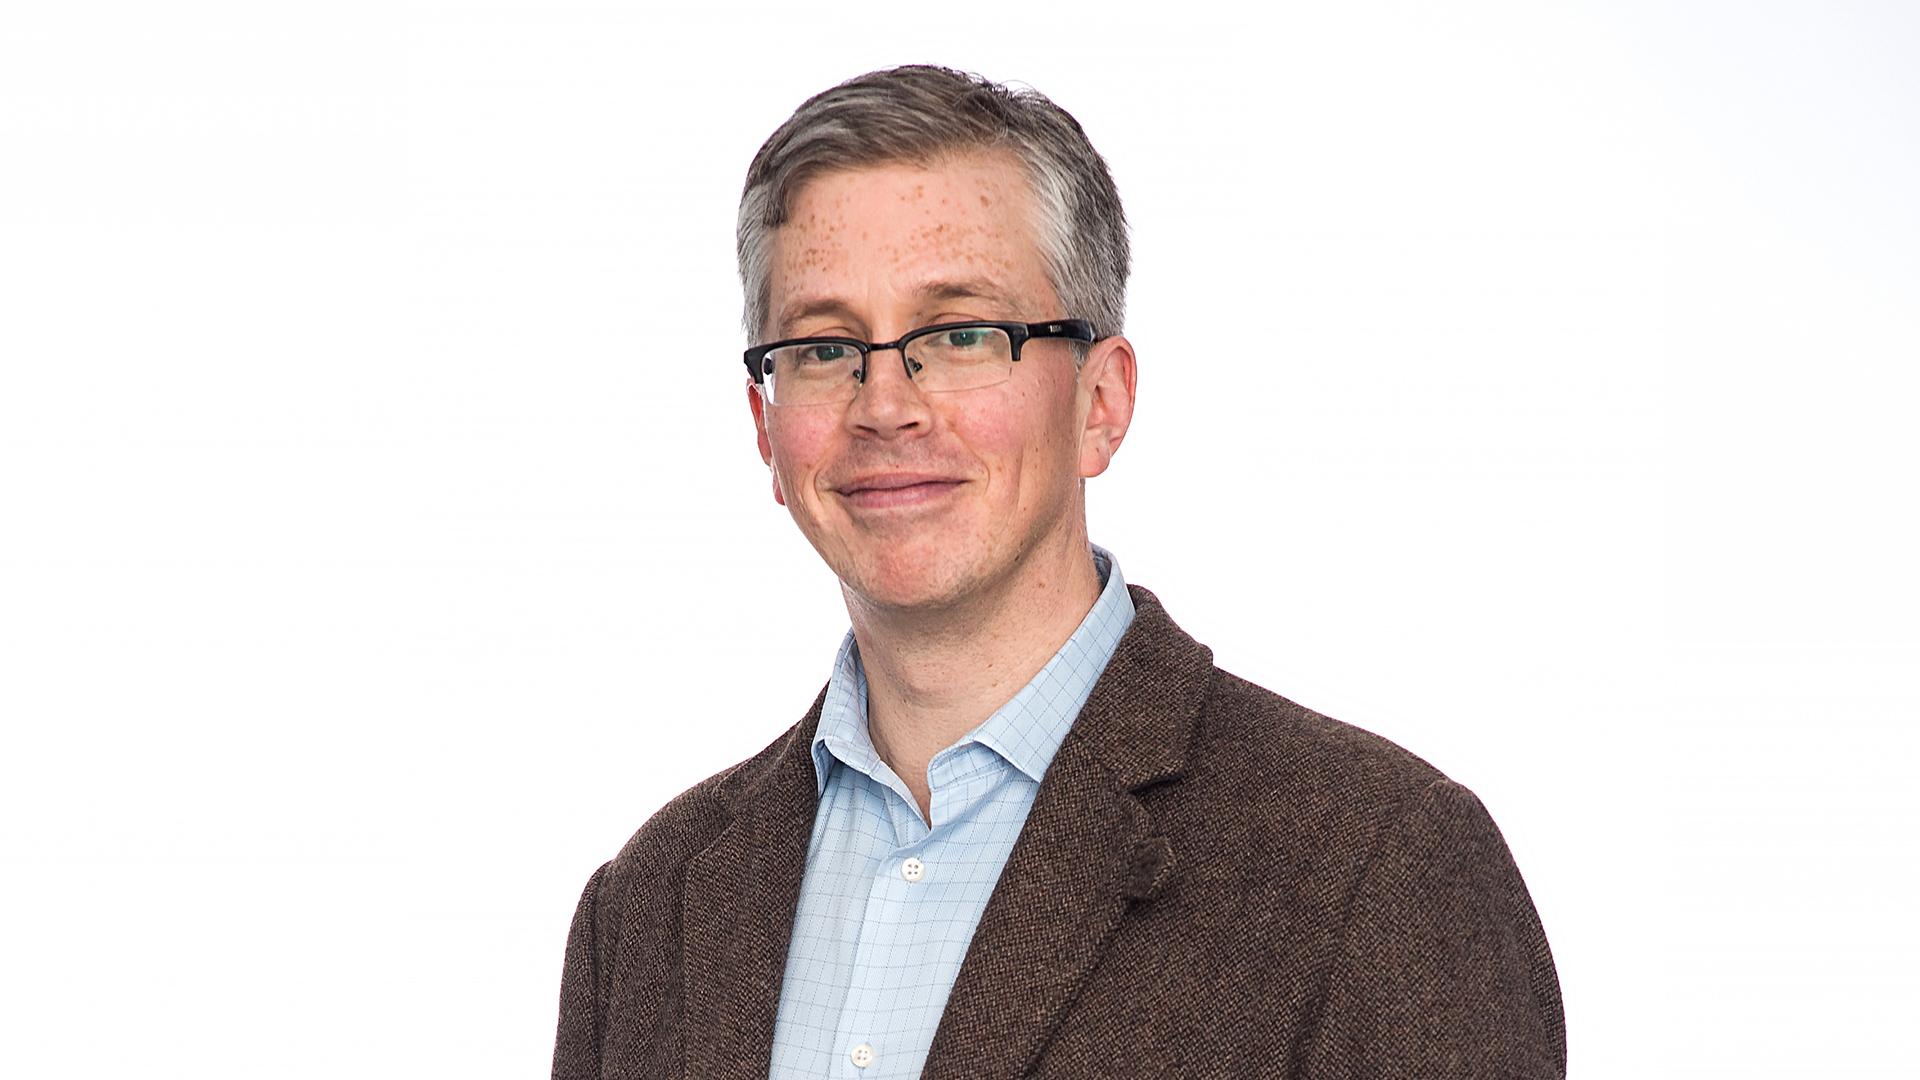 Gregor Craigie, a speaker at Impact 2020 in Victoria, BC